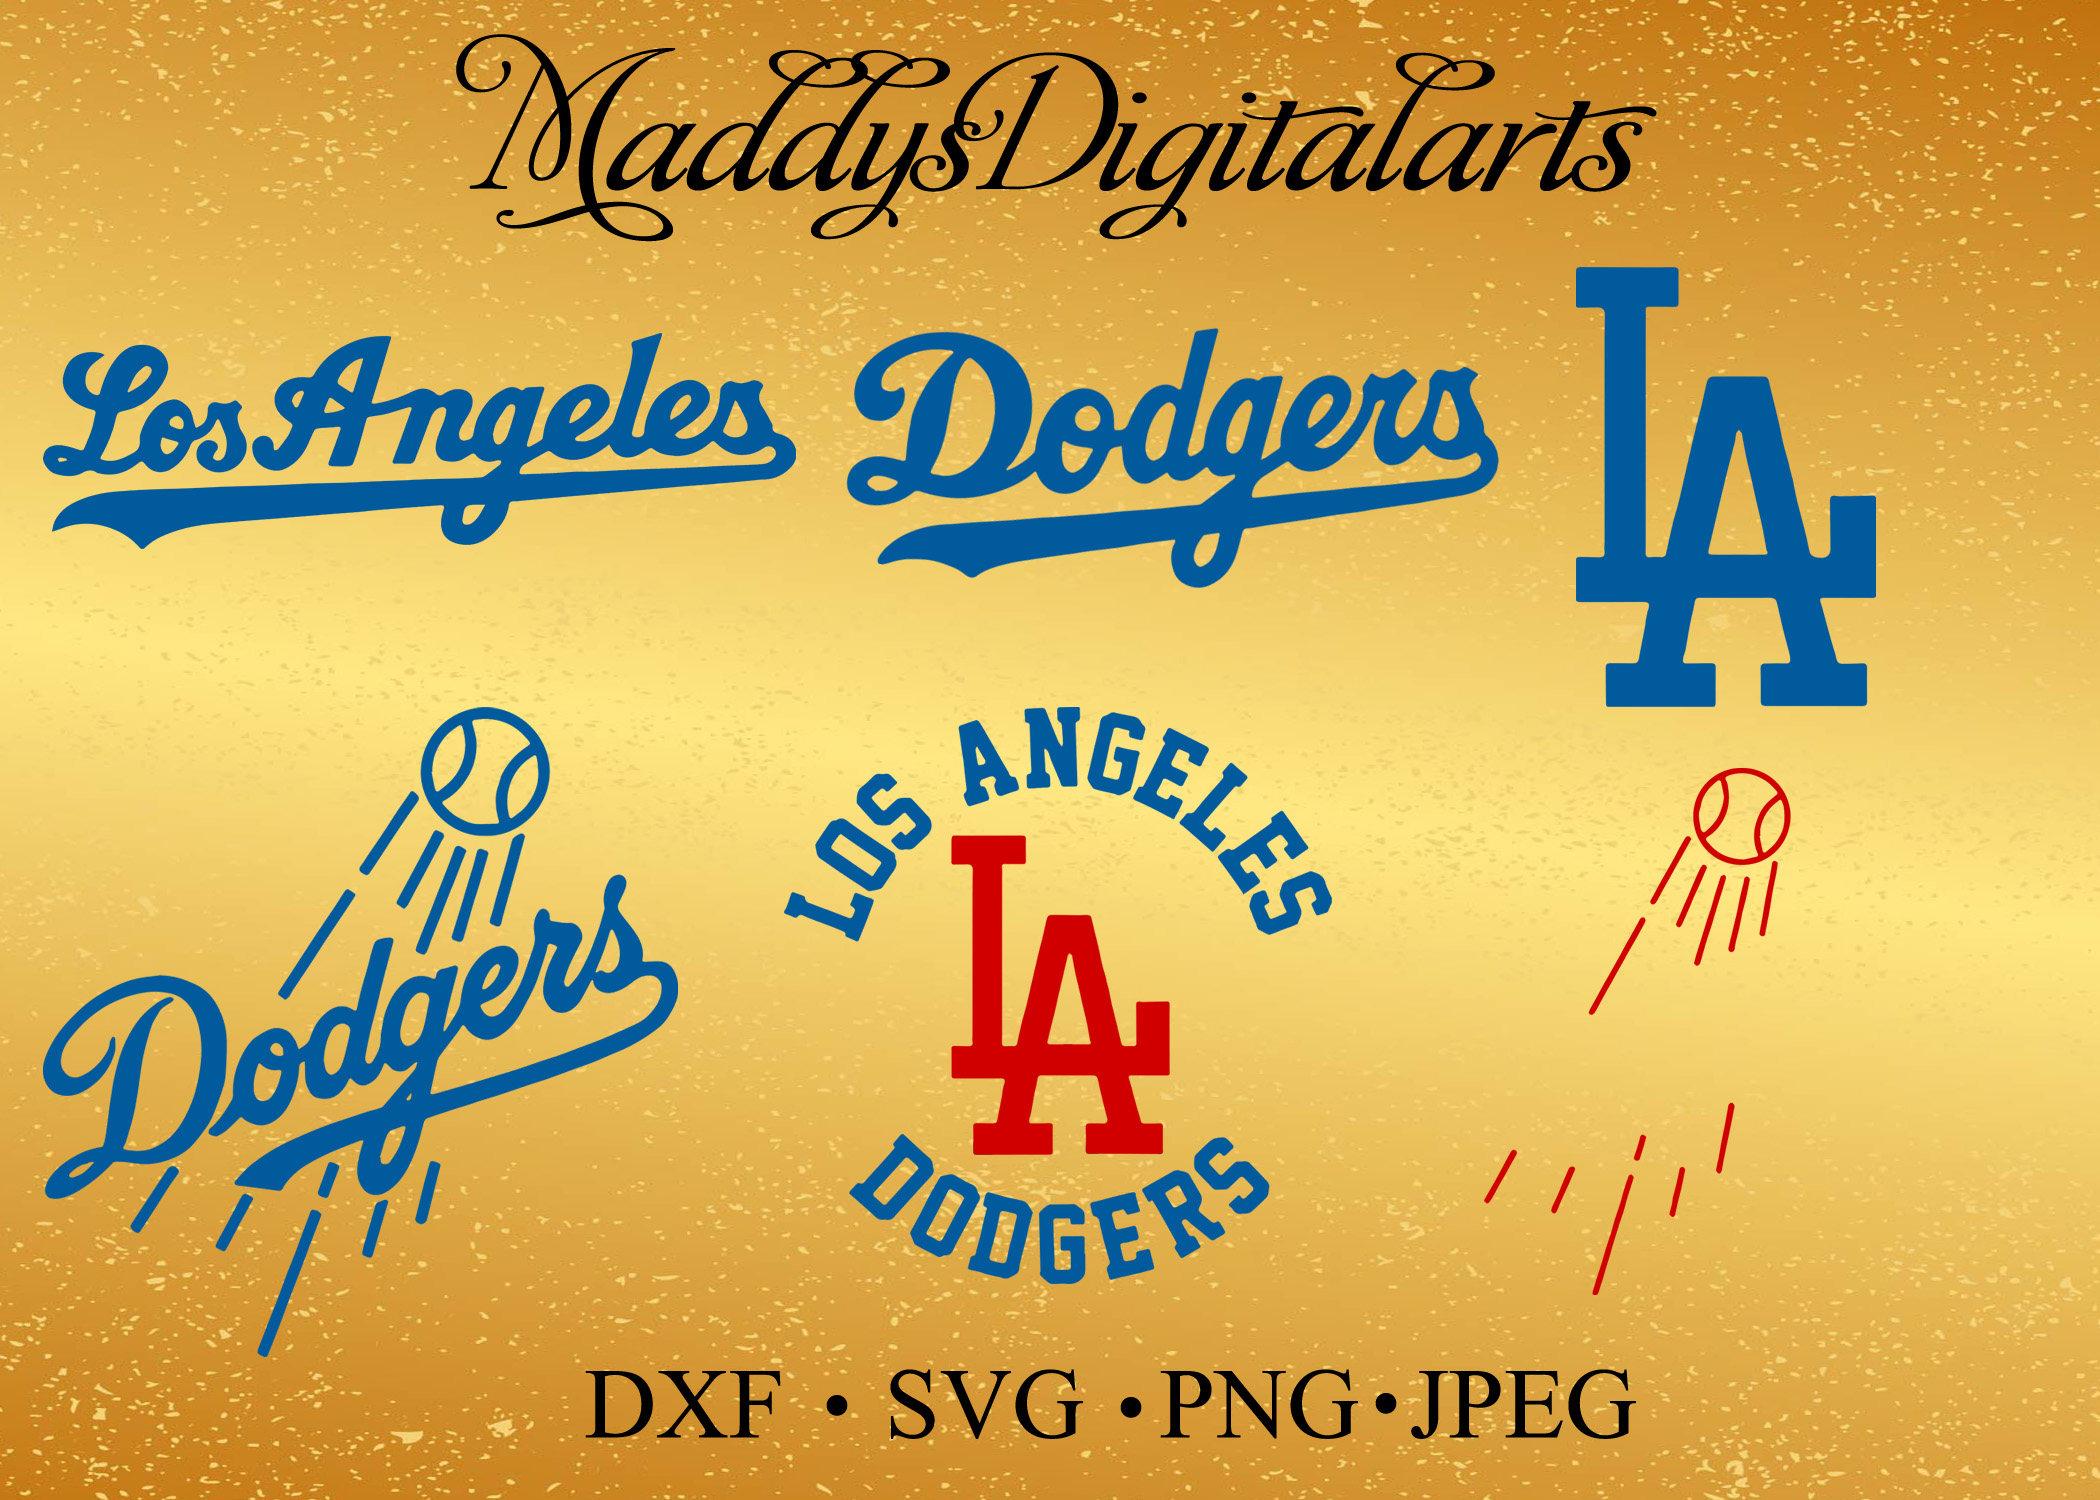 Los Angeles Dodgers Baseball SVG Los Angeles Dodgers Dodgers | Etsy